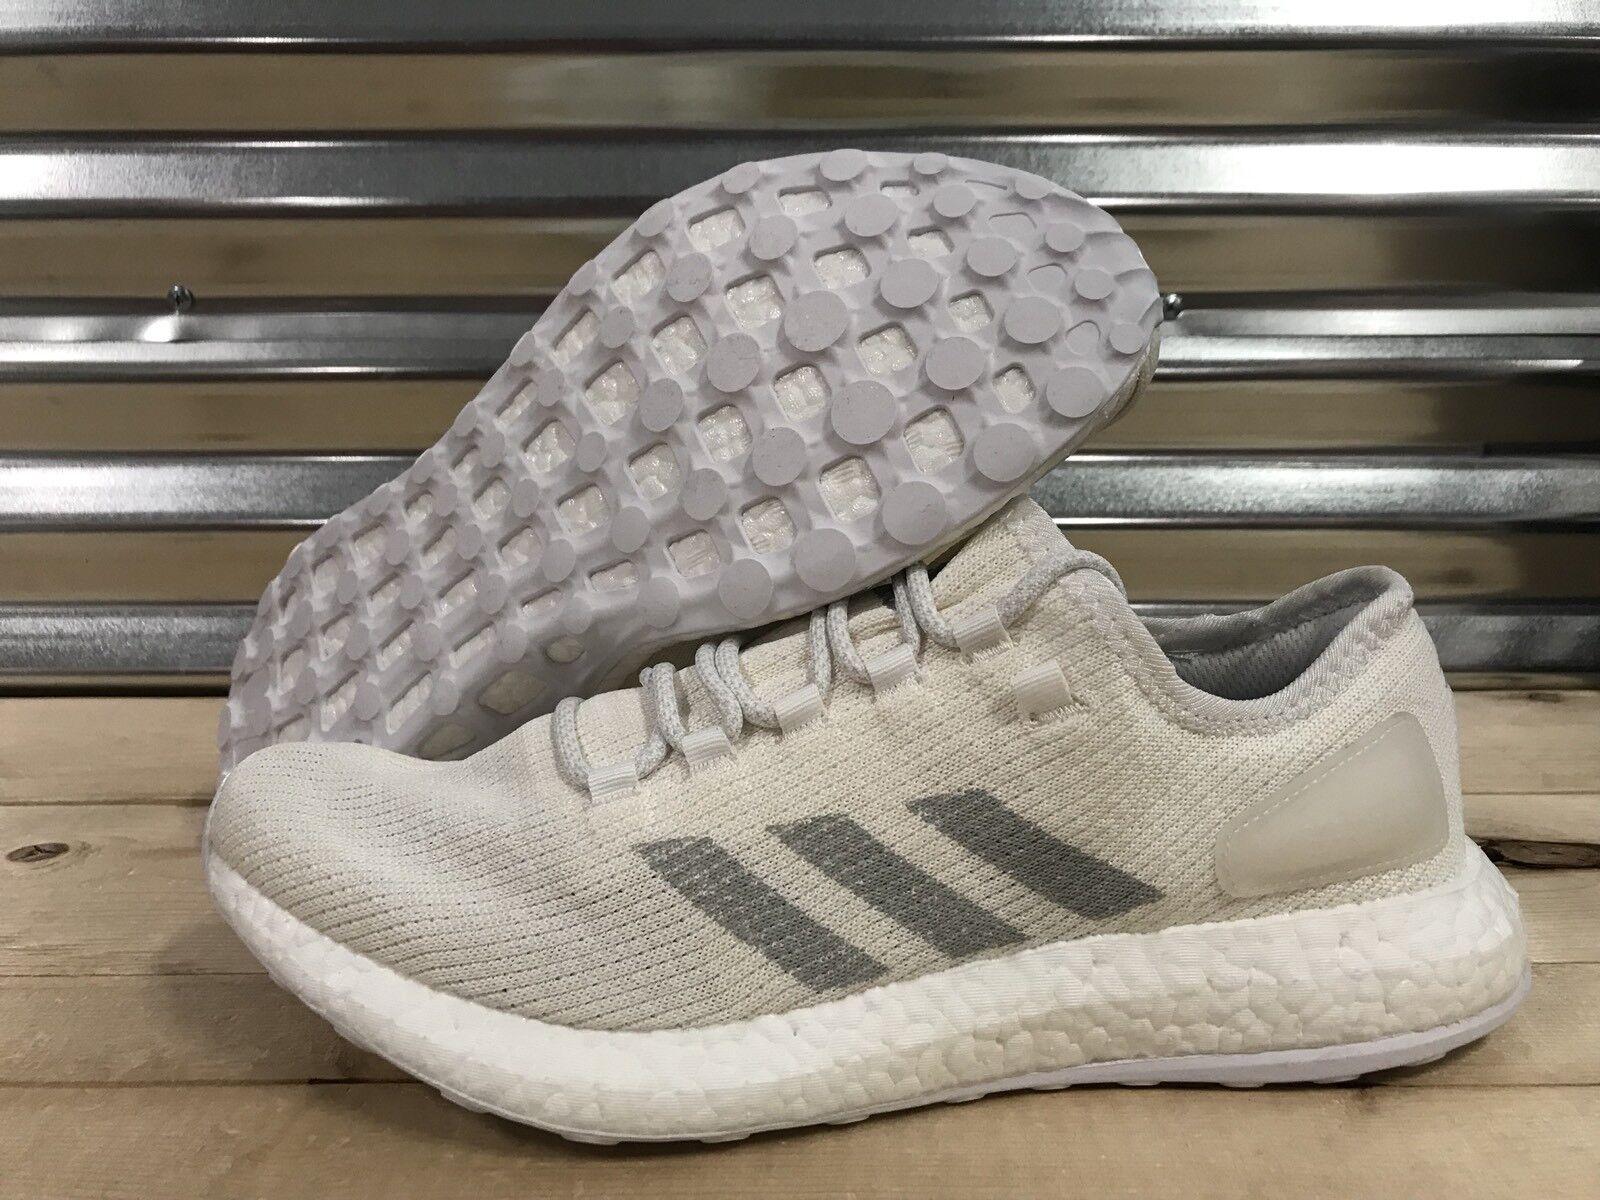 28a705d56bd04 Adidas PureBoost Boost Running Shoes White Gray Chalk SZ 11.5 ( BA9058 )